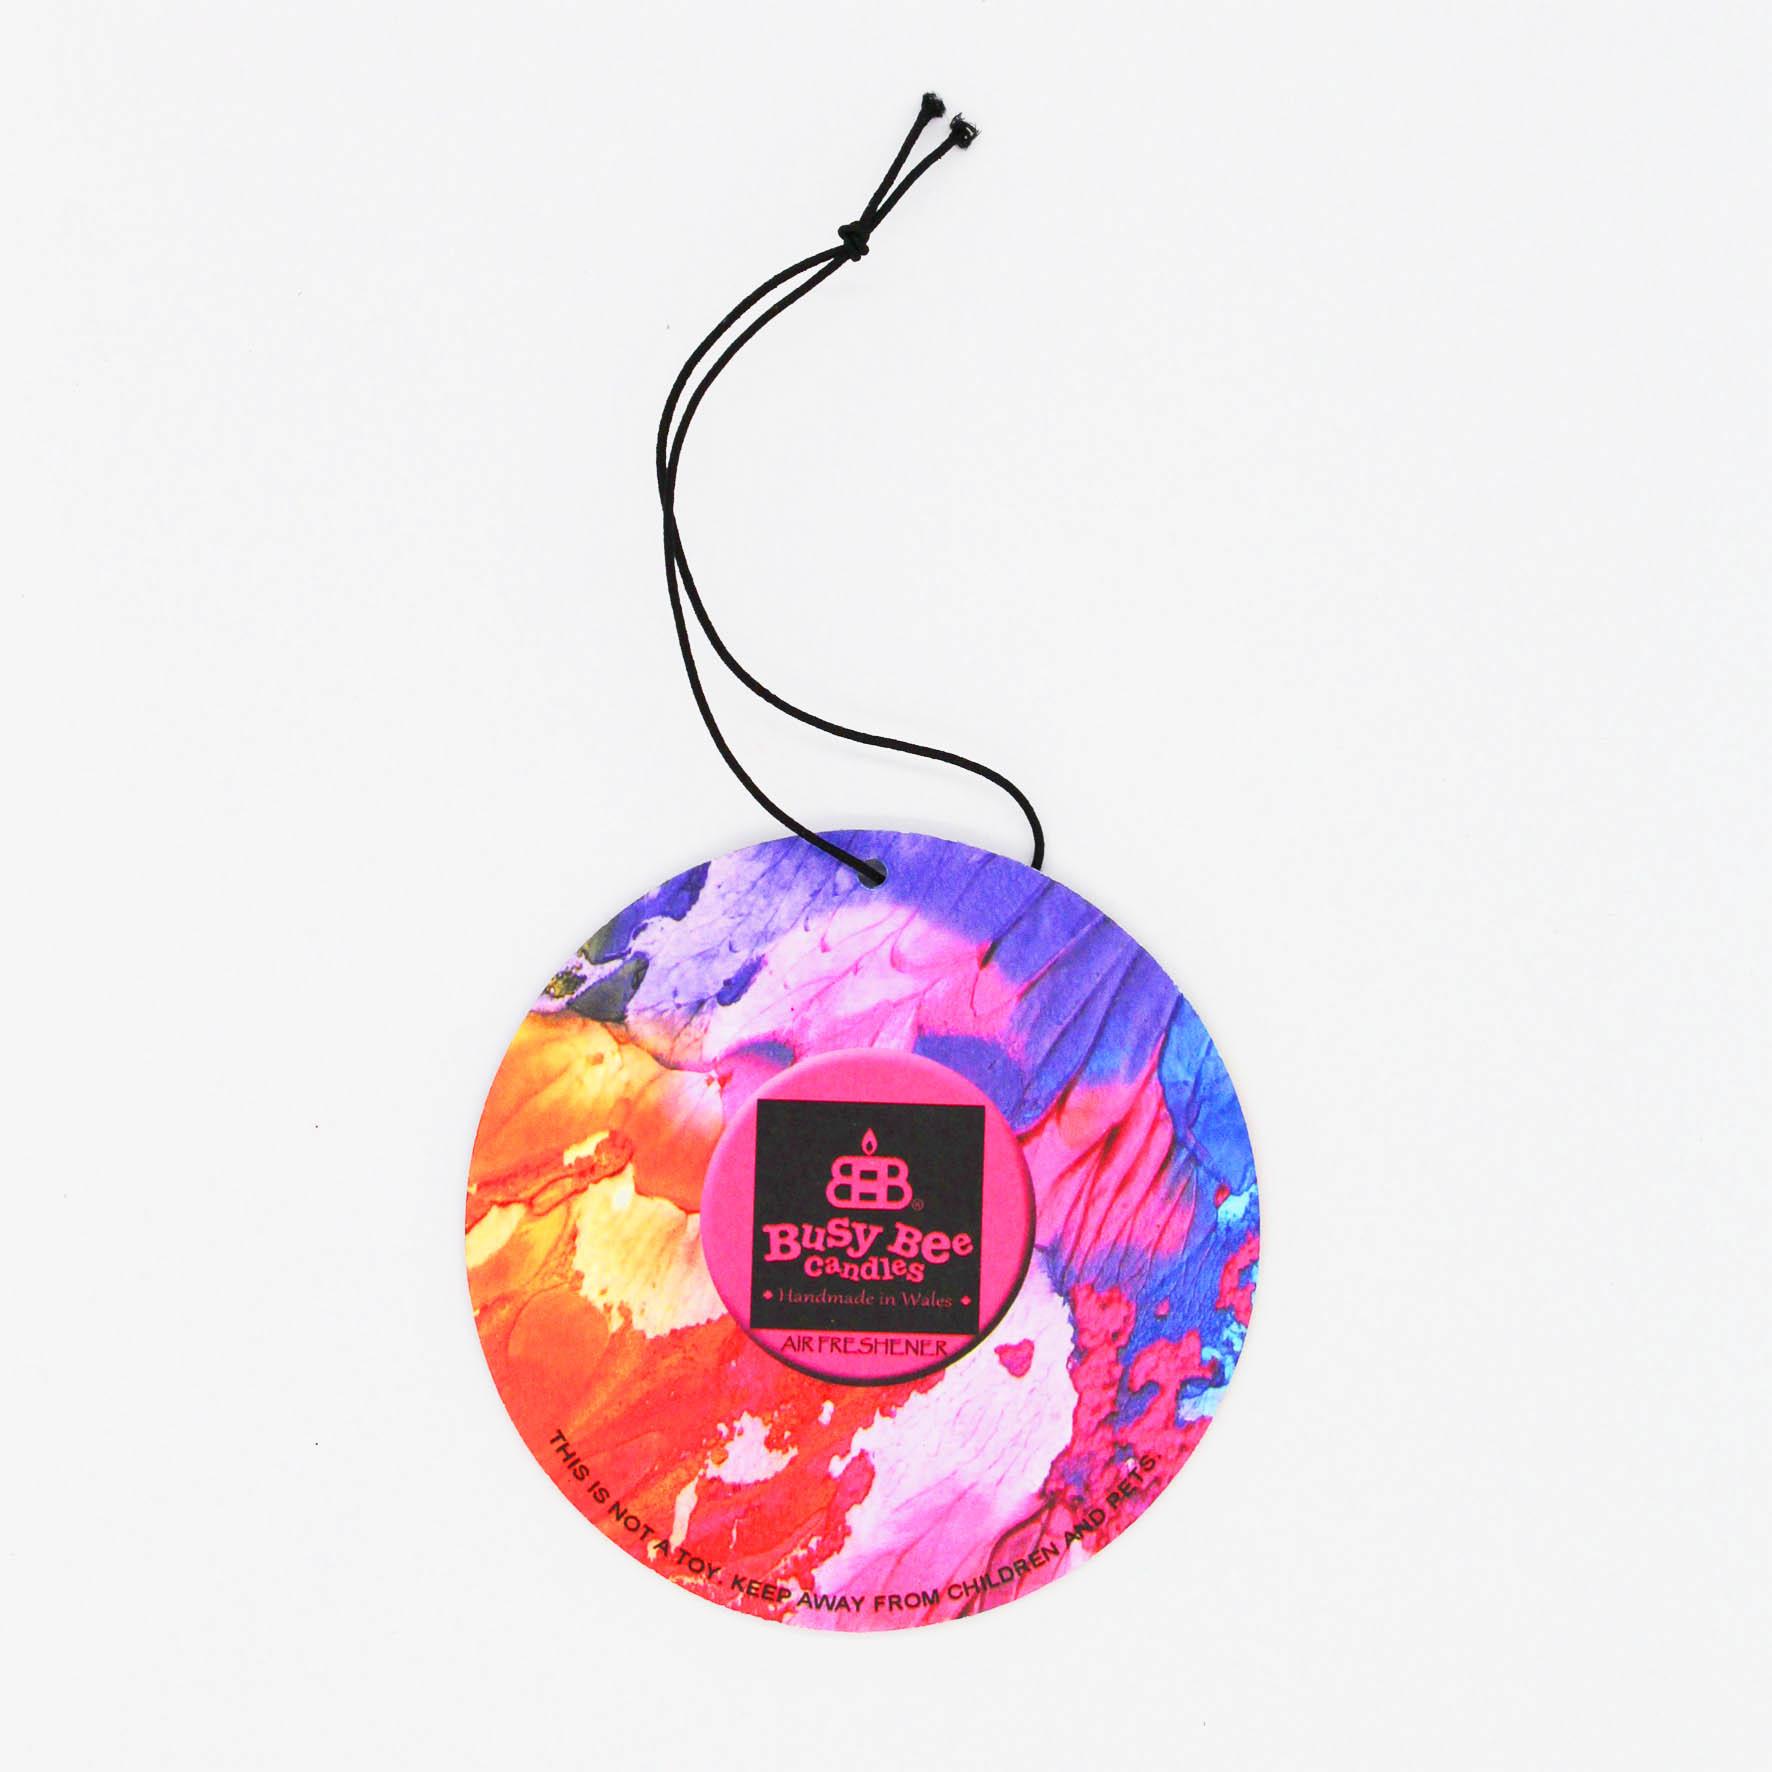 Twilight Hanging Air Freshener